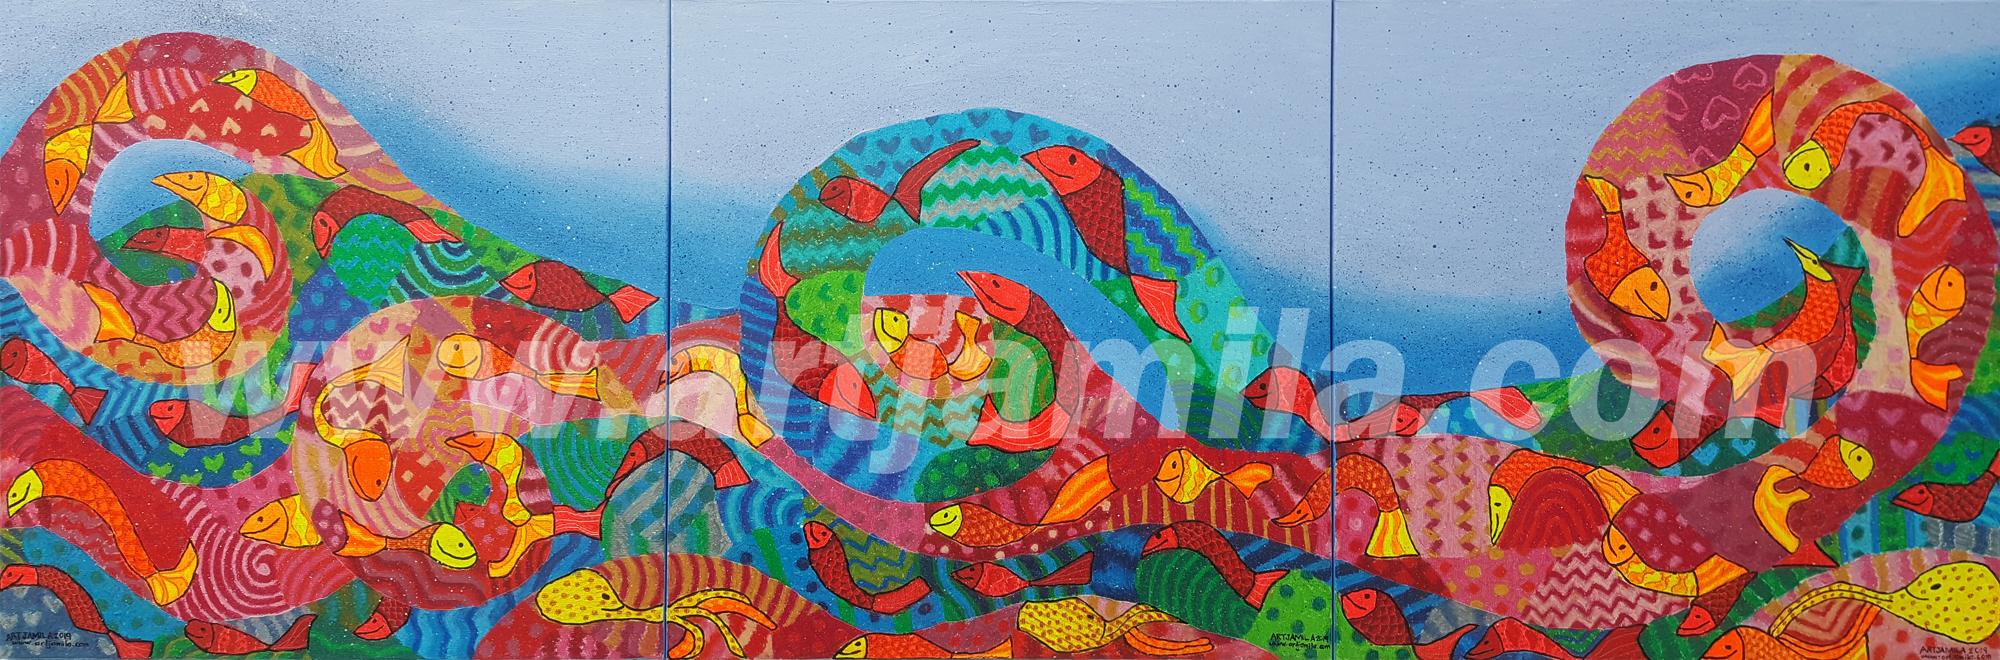 Fishmosaic Wave Series 3 ABC watermark